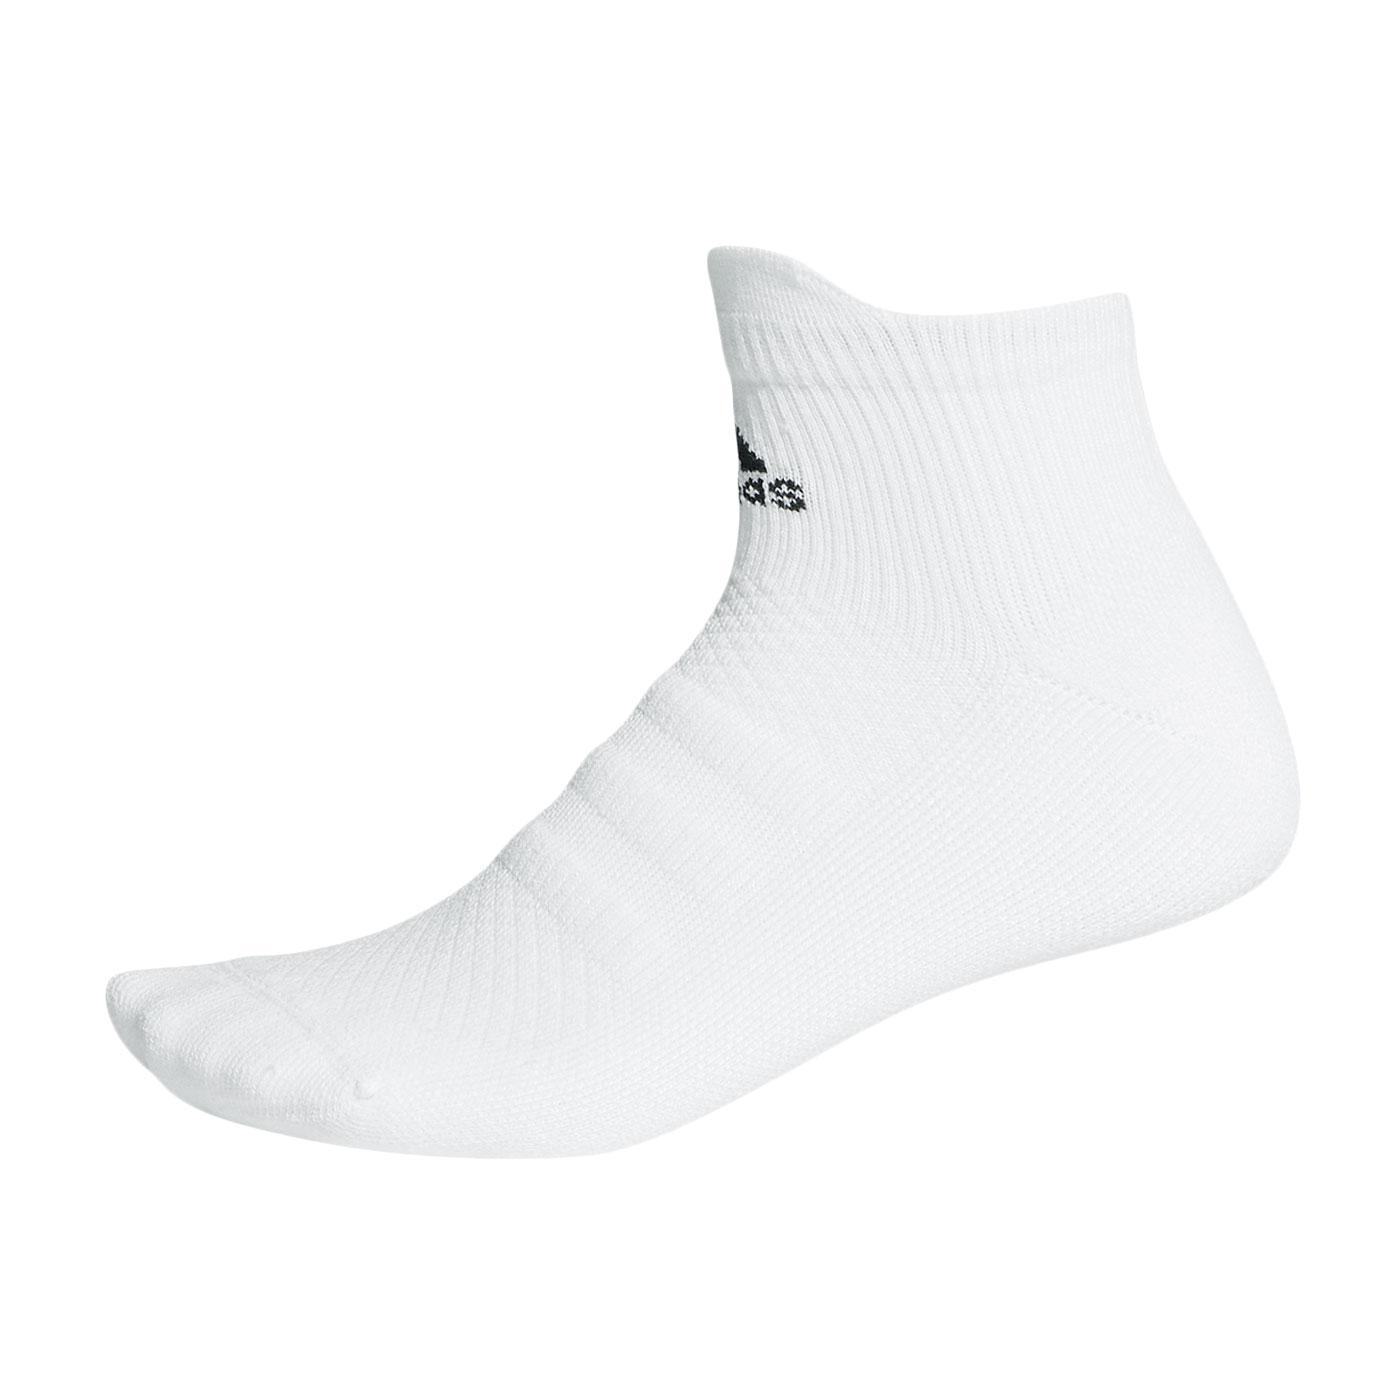 ADIDAS 襪子 FK0961